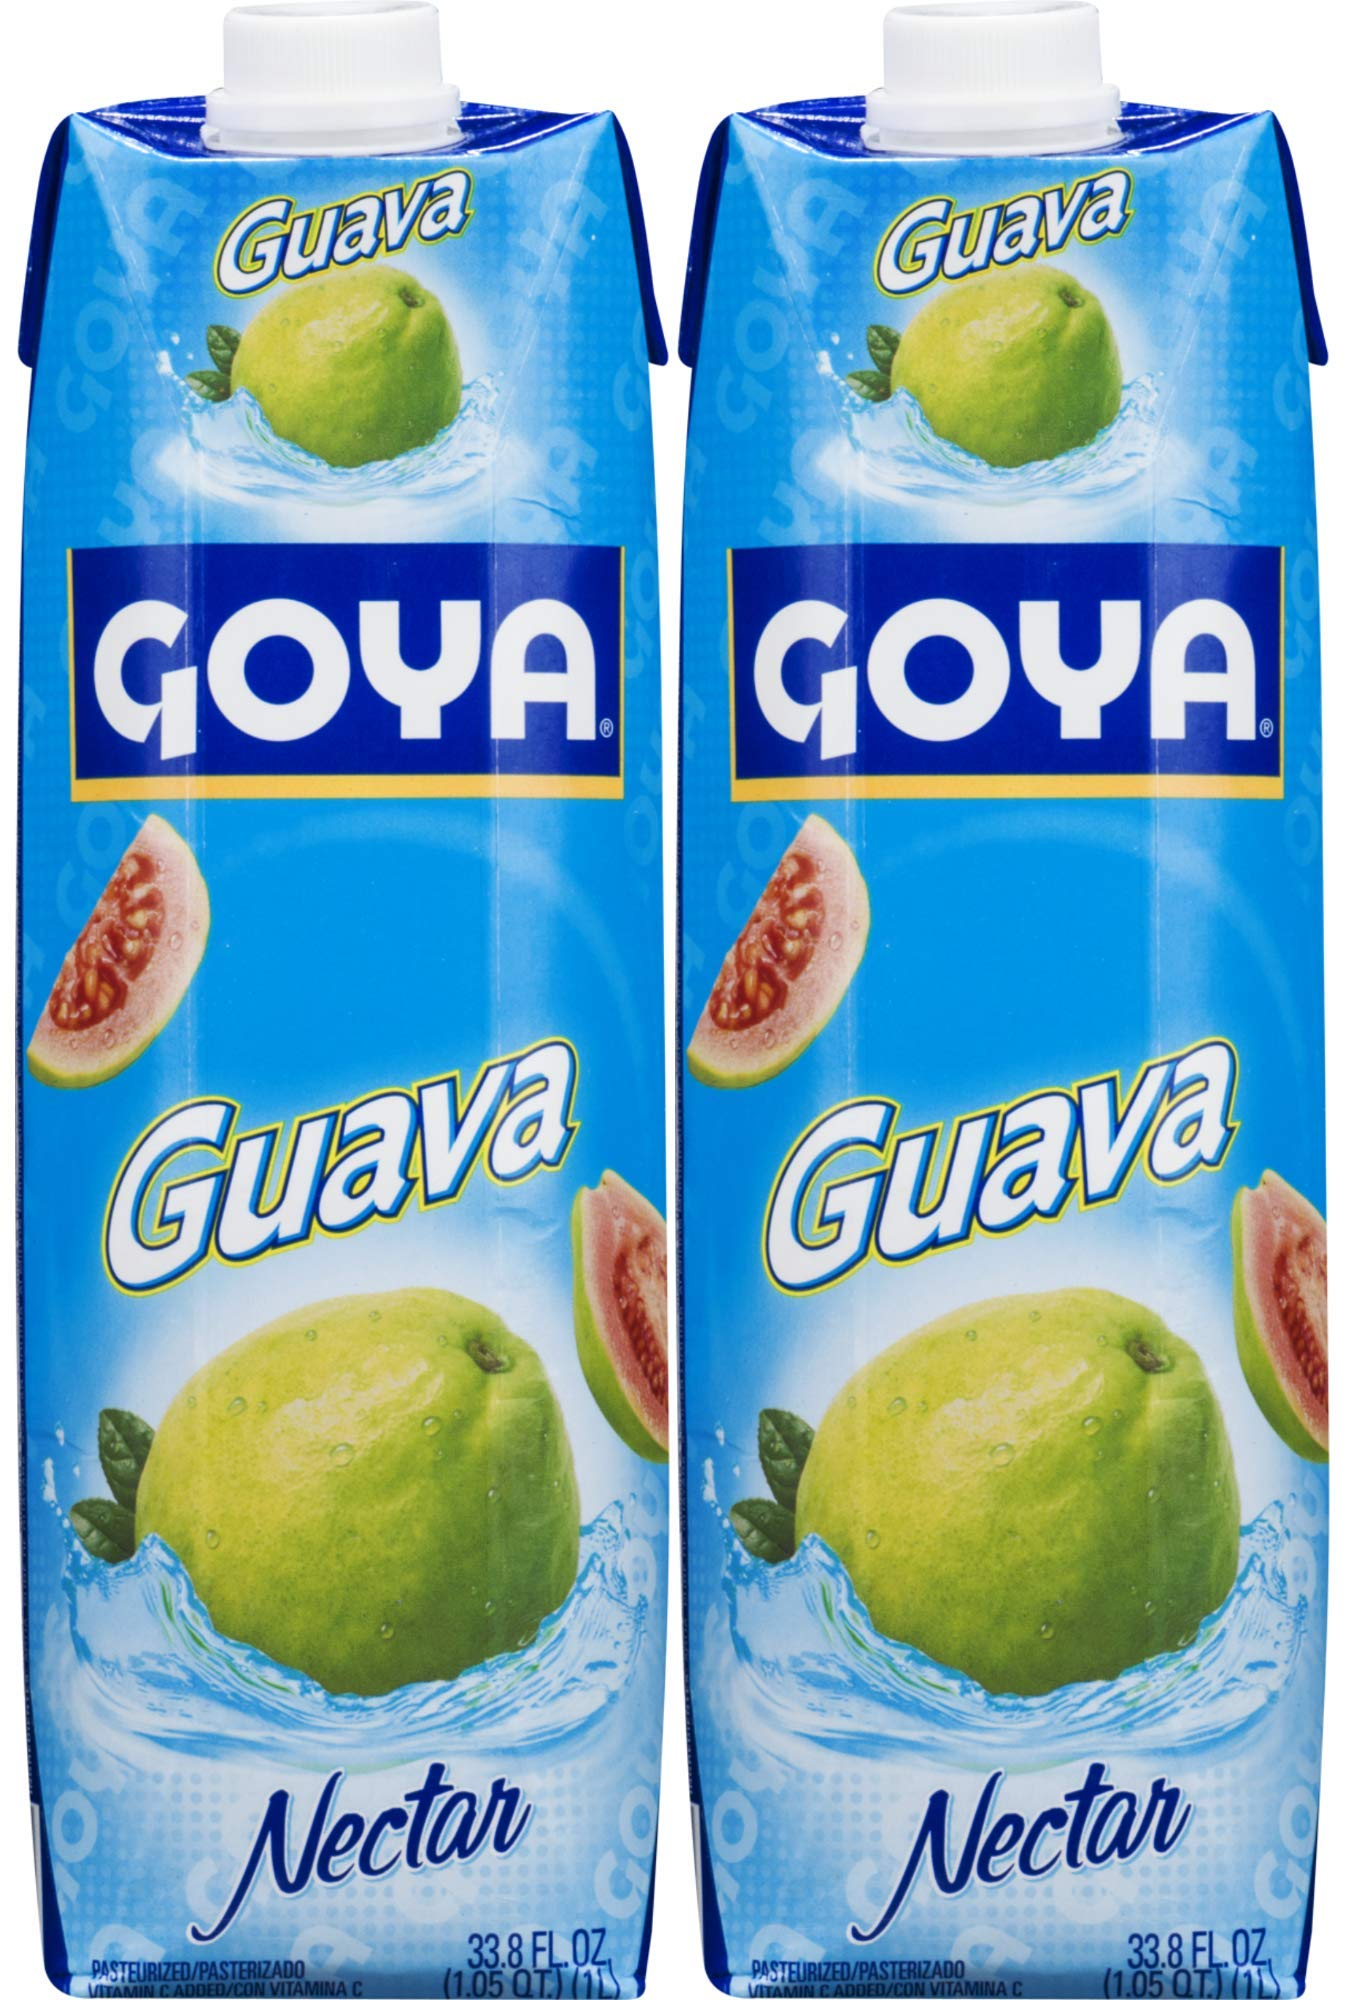 Goya Guava Nectar 33.8oz (Pack of 02)